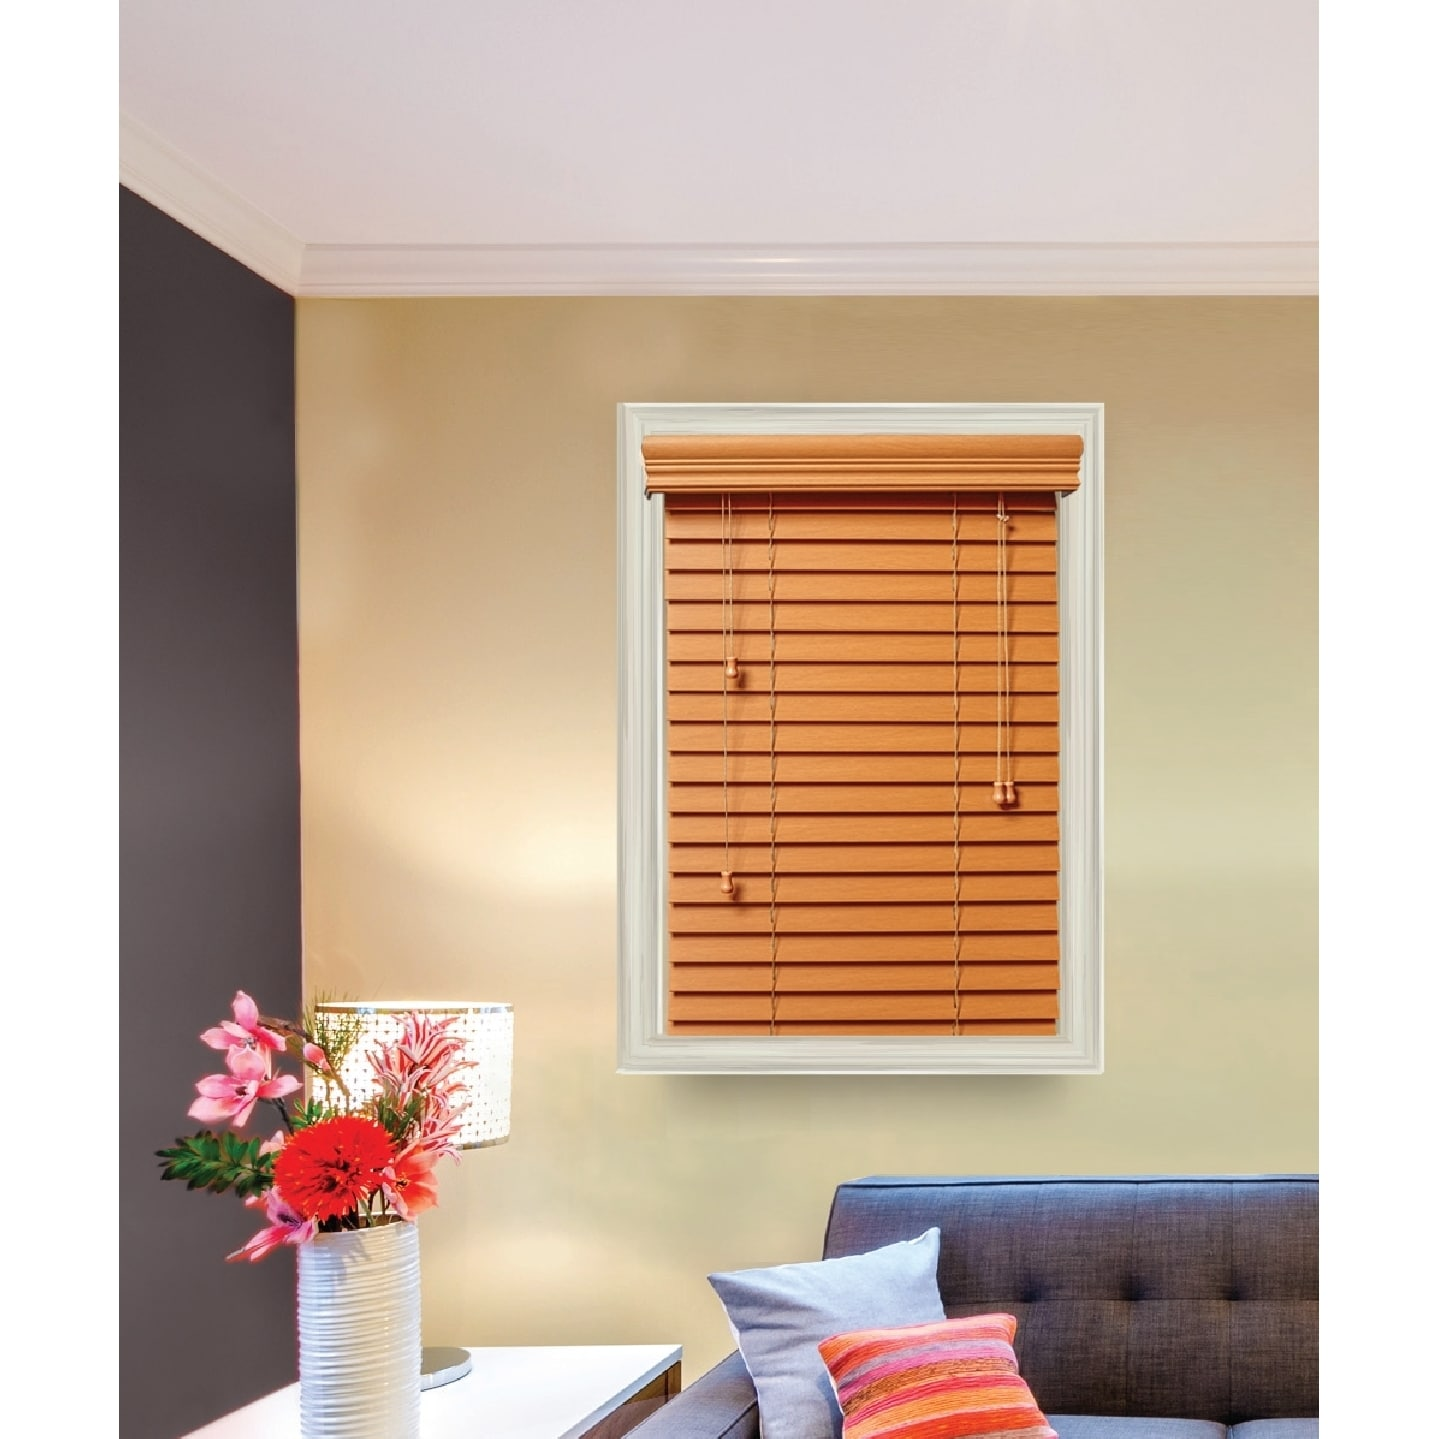 Lotus /& Windoware 2 INCH Faux Wood Blind 27 X 72